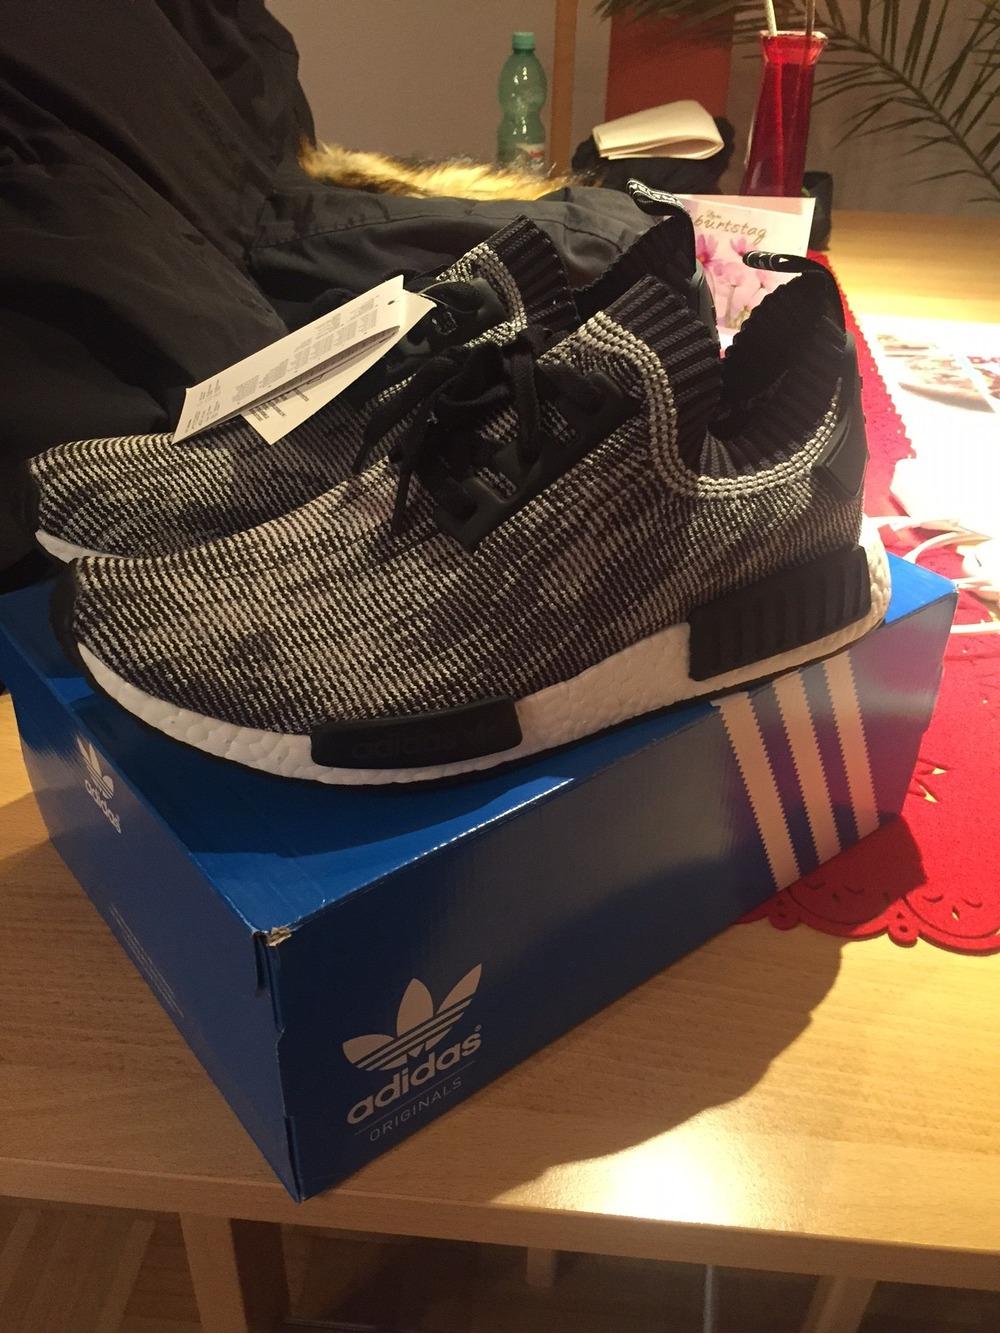 fmorhp Adidas NMD Runner PK NMD Runner PK US 8 EU 43 1/3 (#290677) from